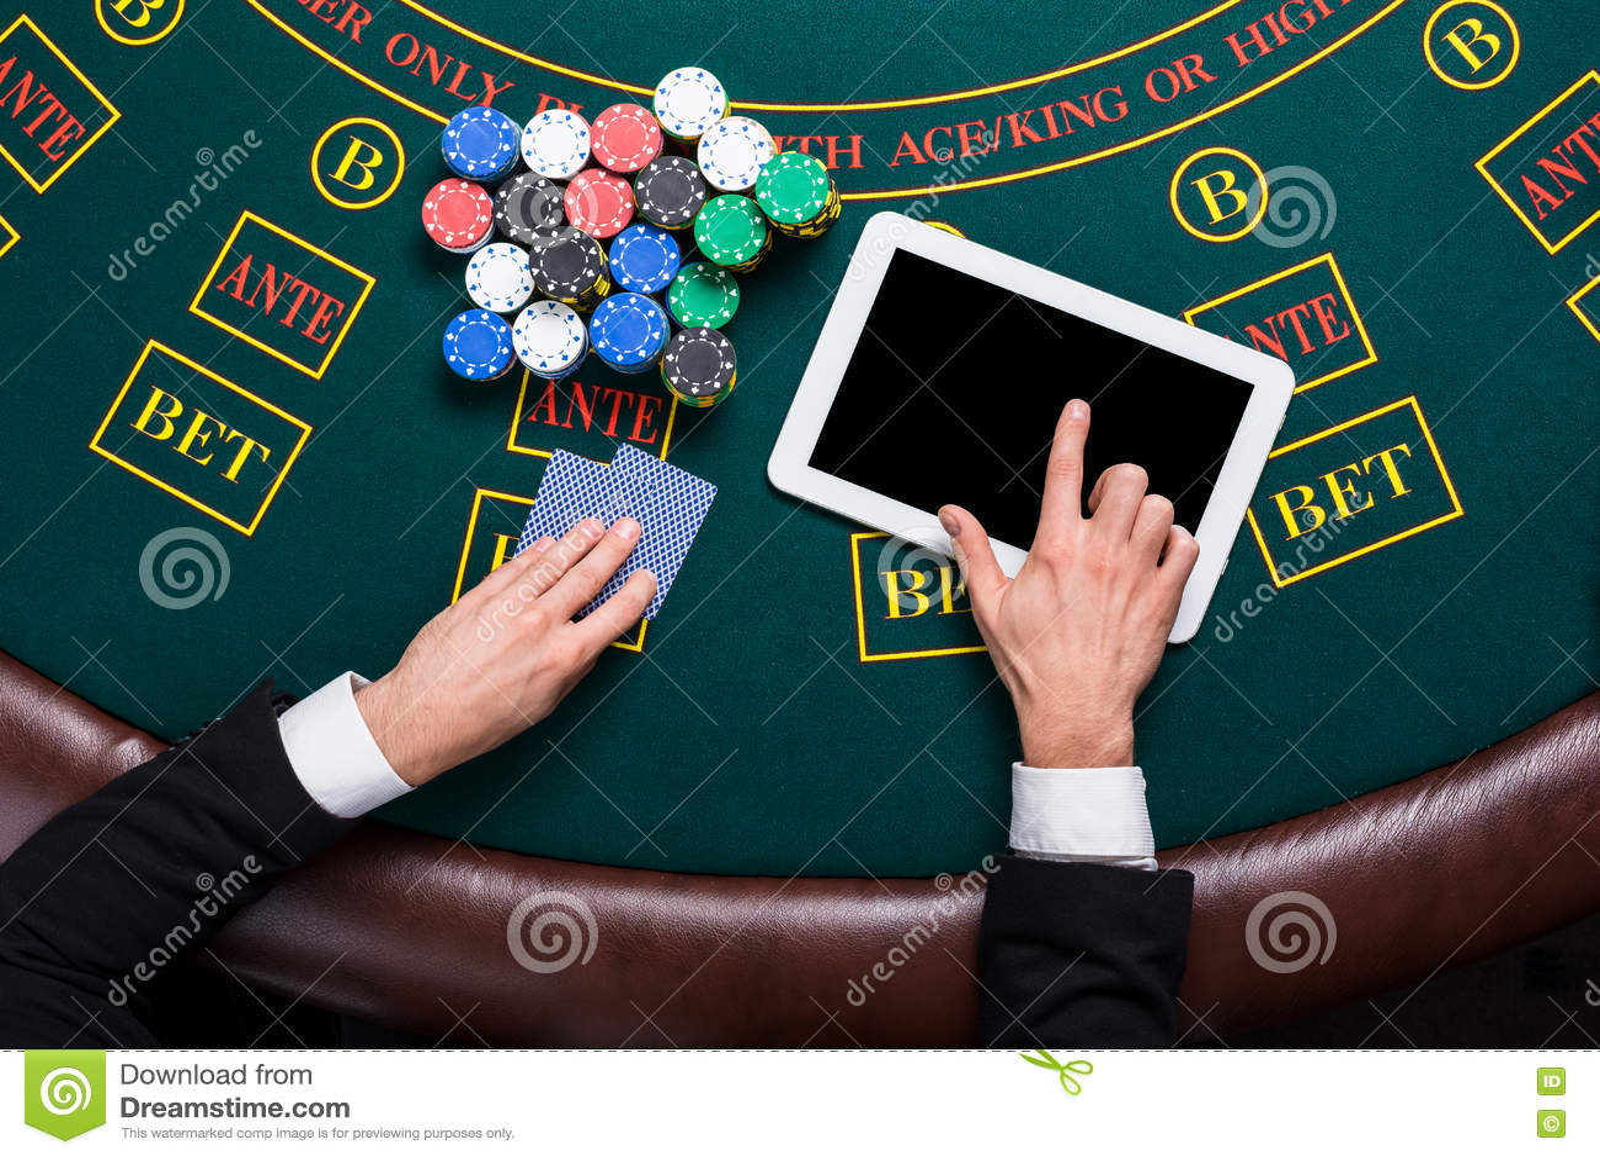 Casino Club Zahlenfolge 259443